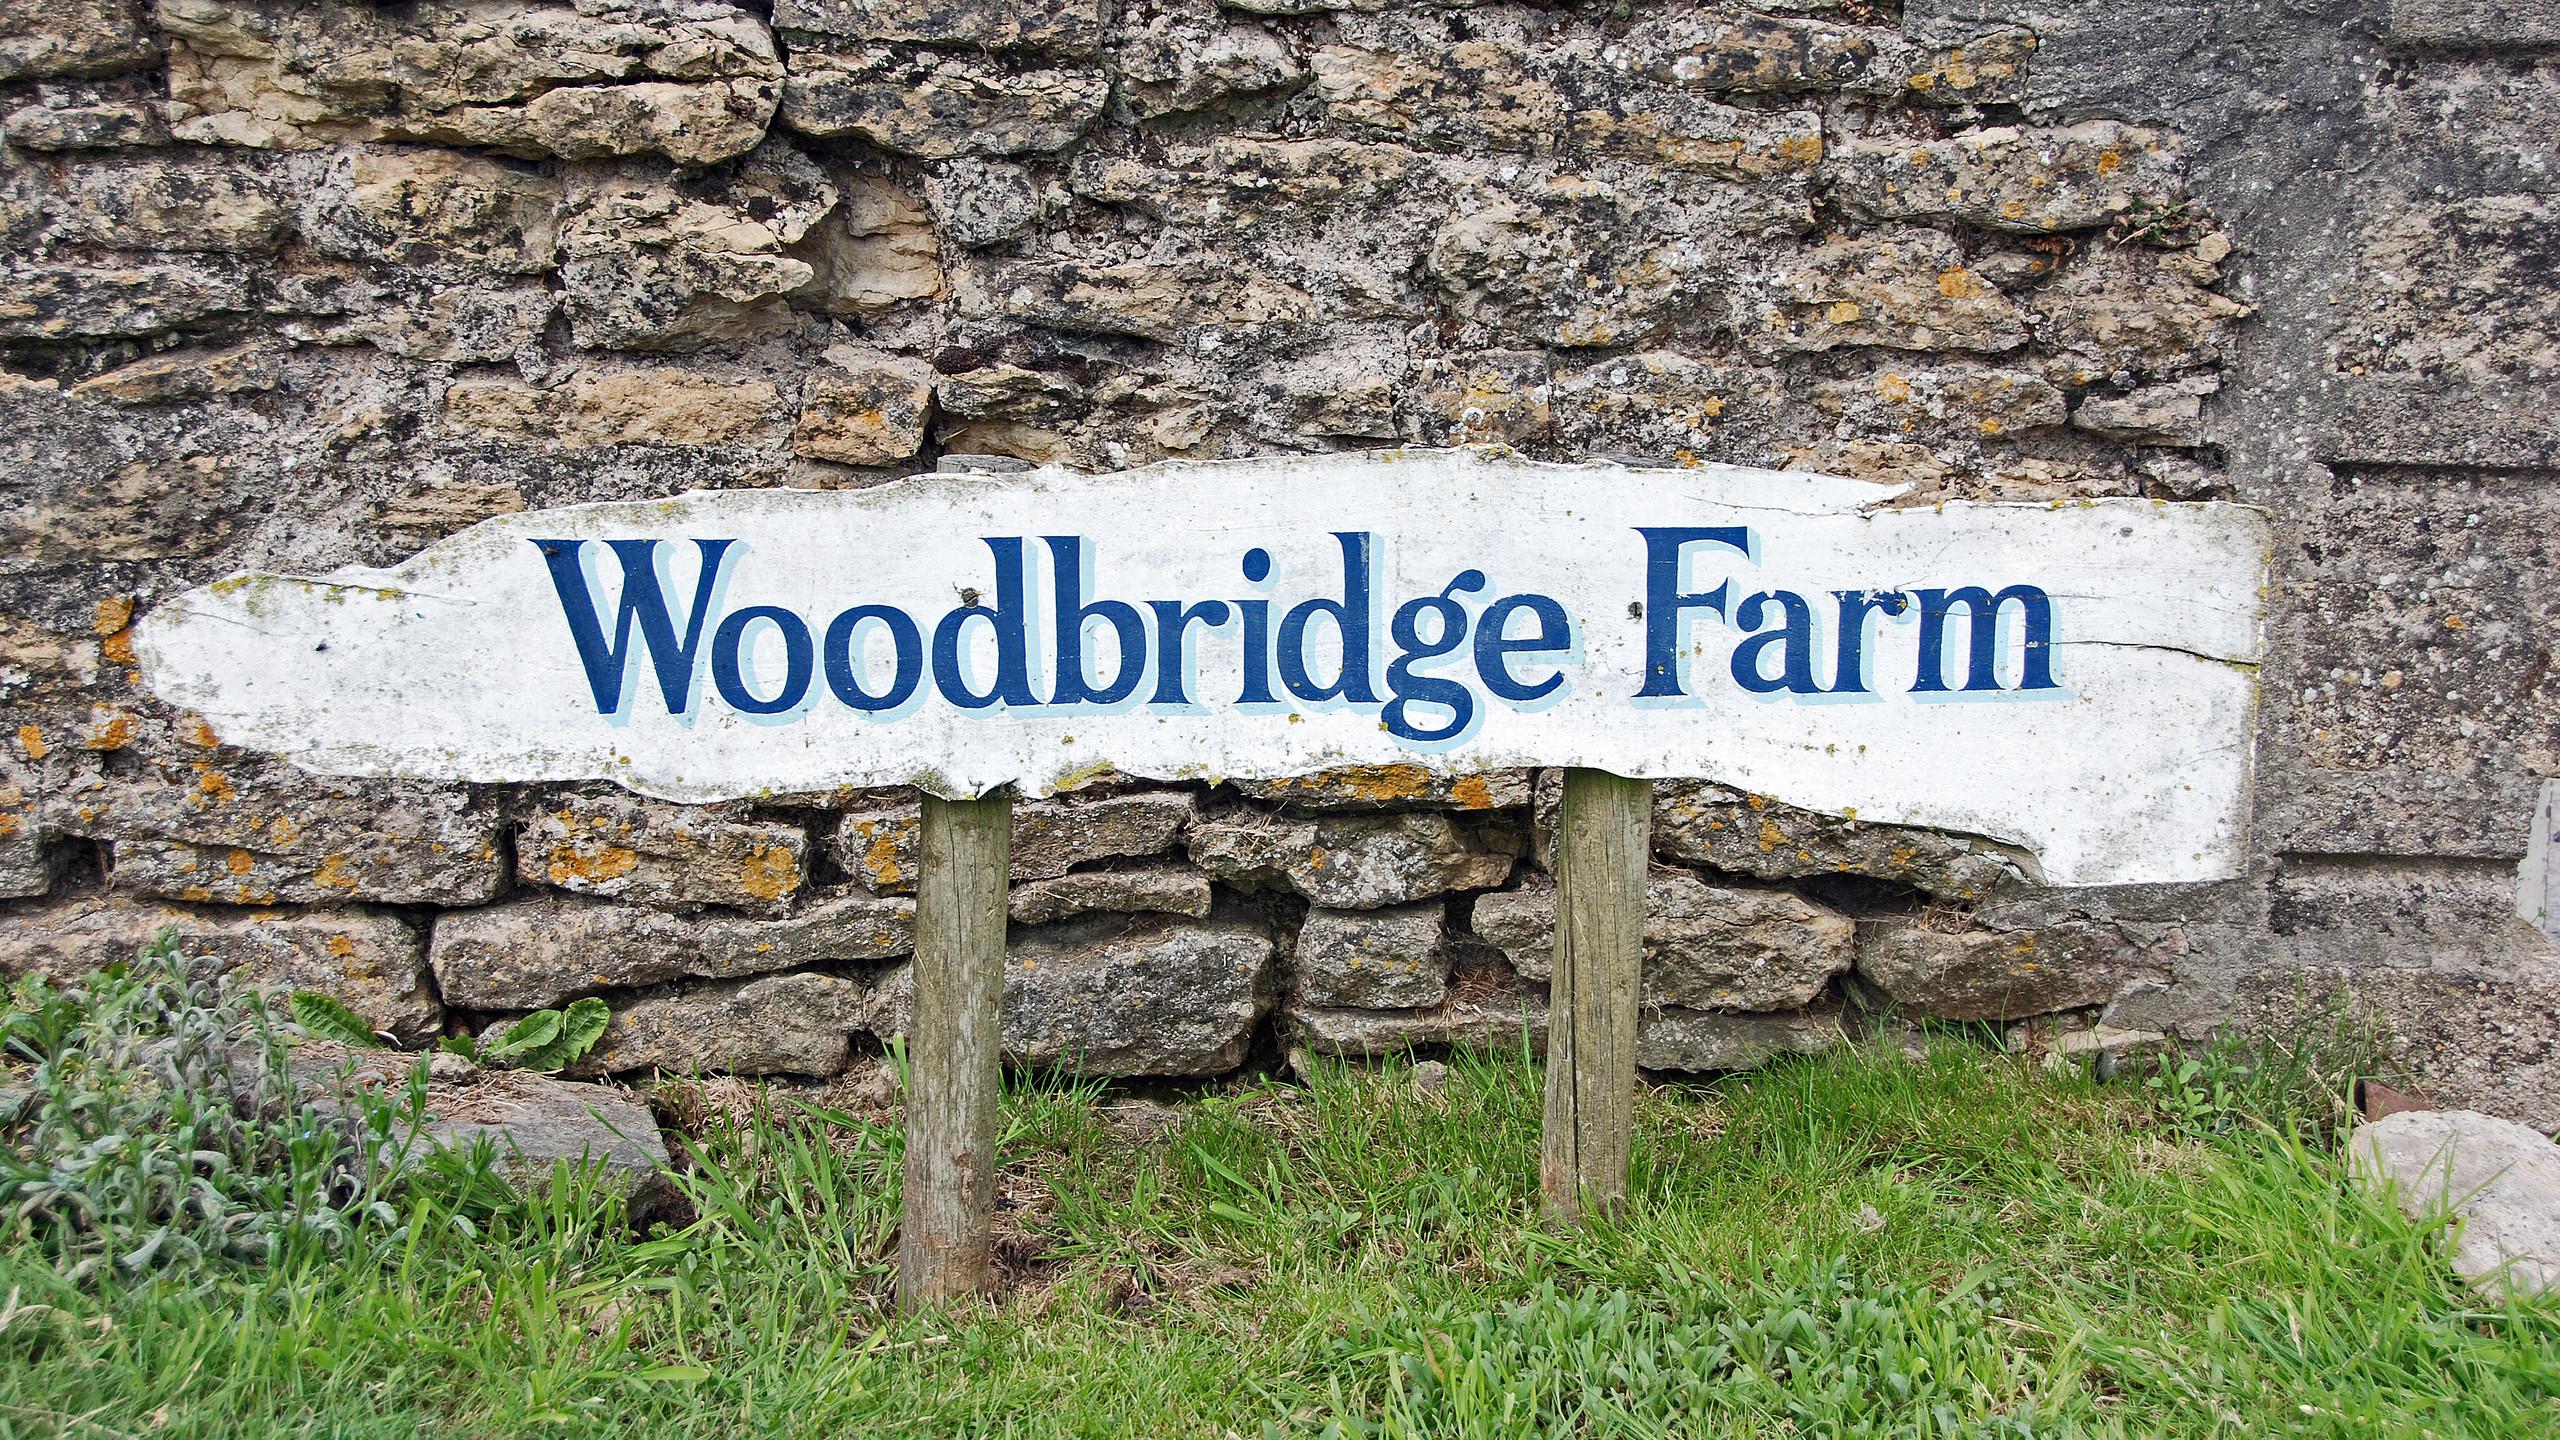 Woodbridge Farm